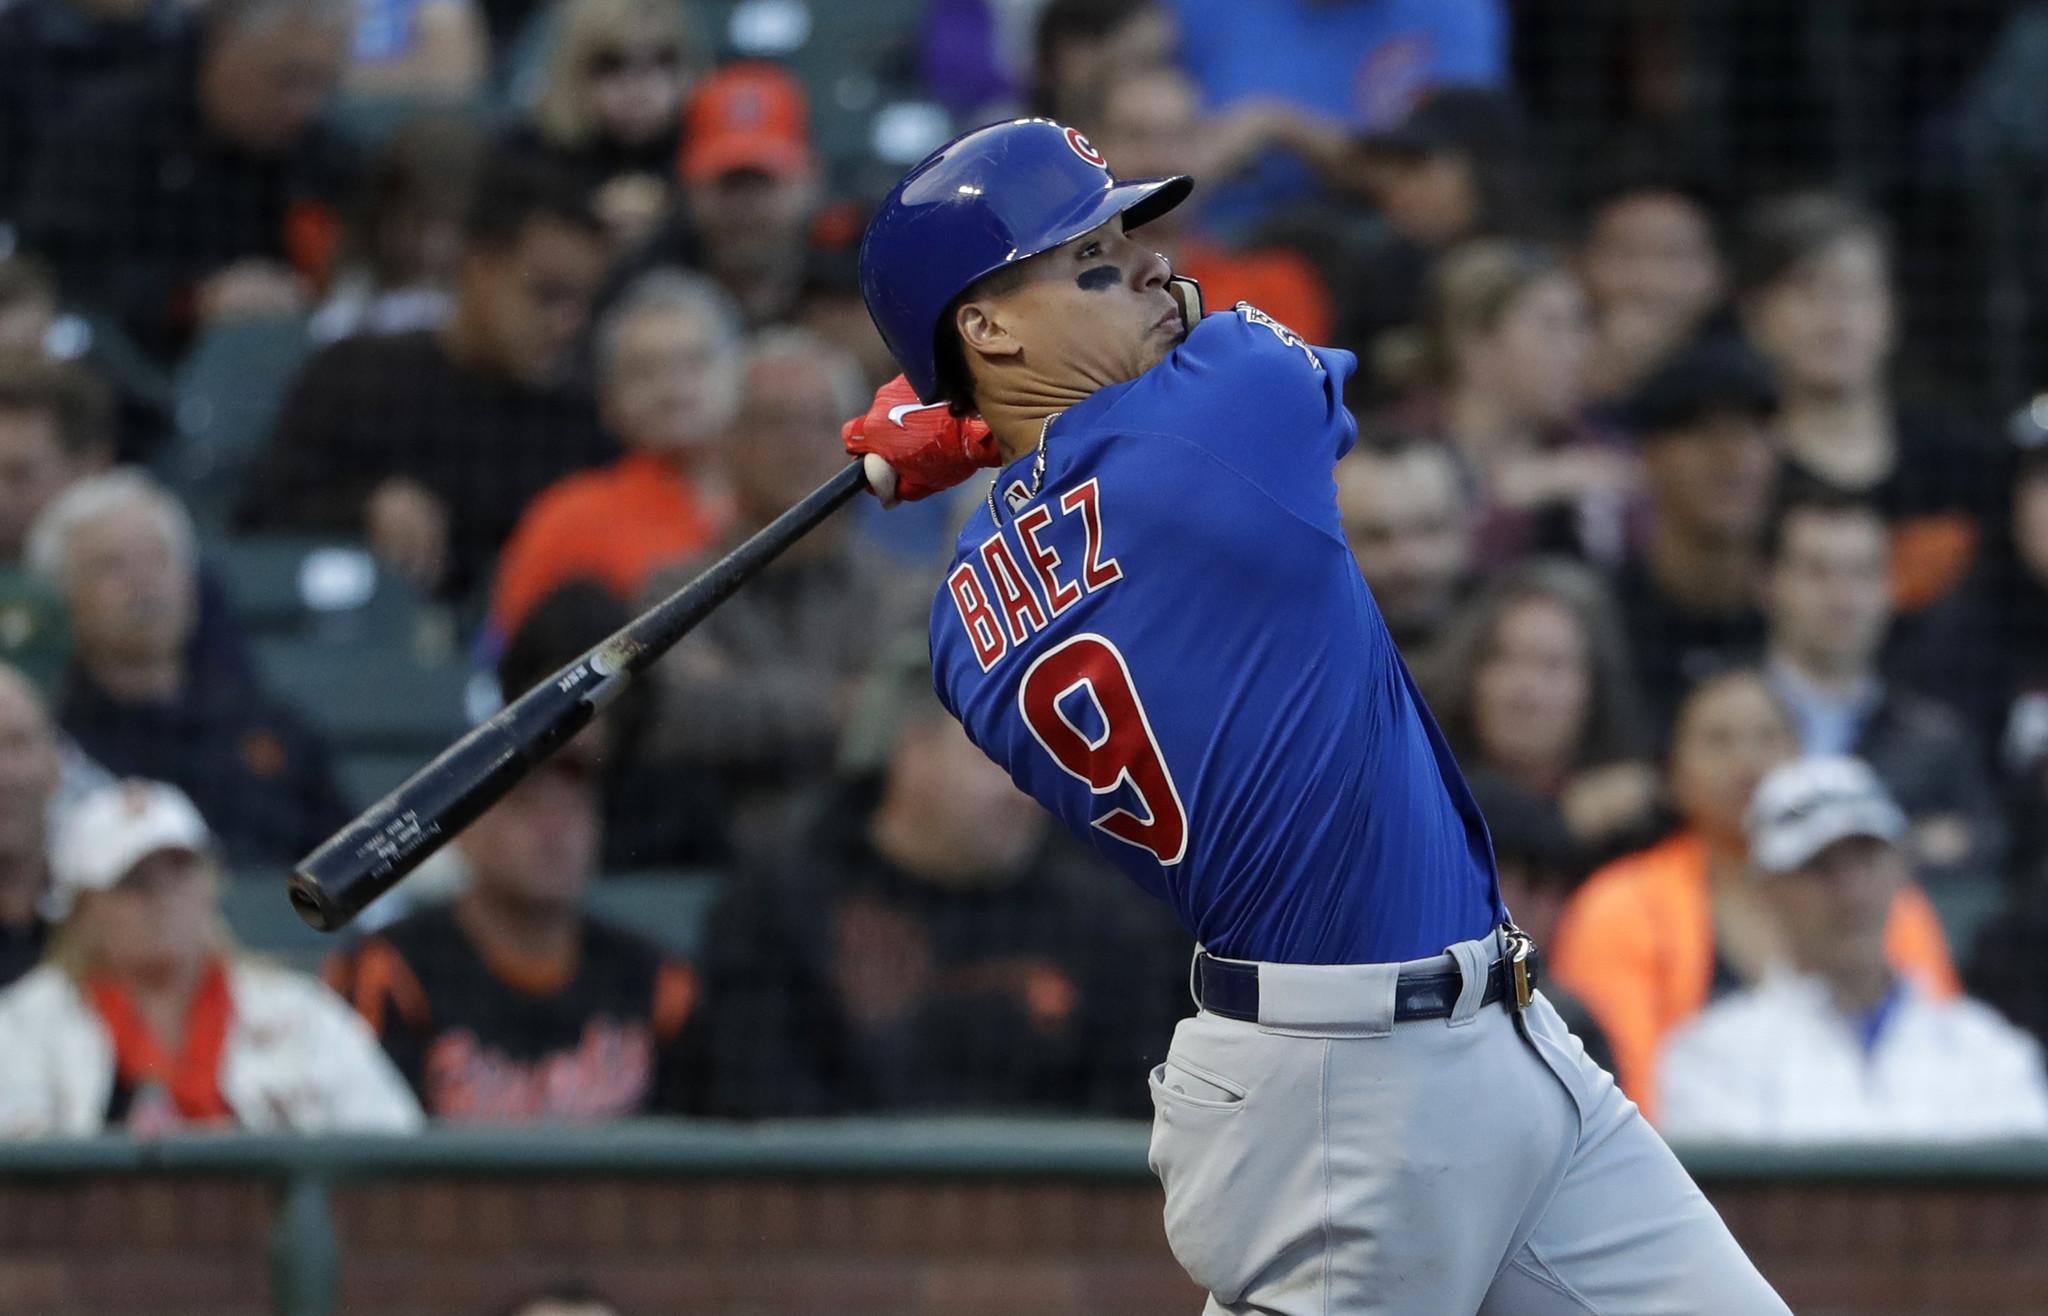 Javier Baez insidethepark HR sparks Cubs to 53 win over Giants  Chicago Tribune